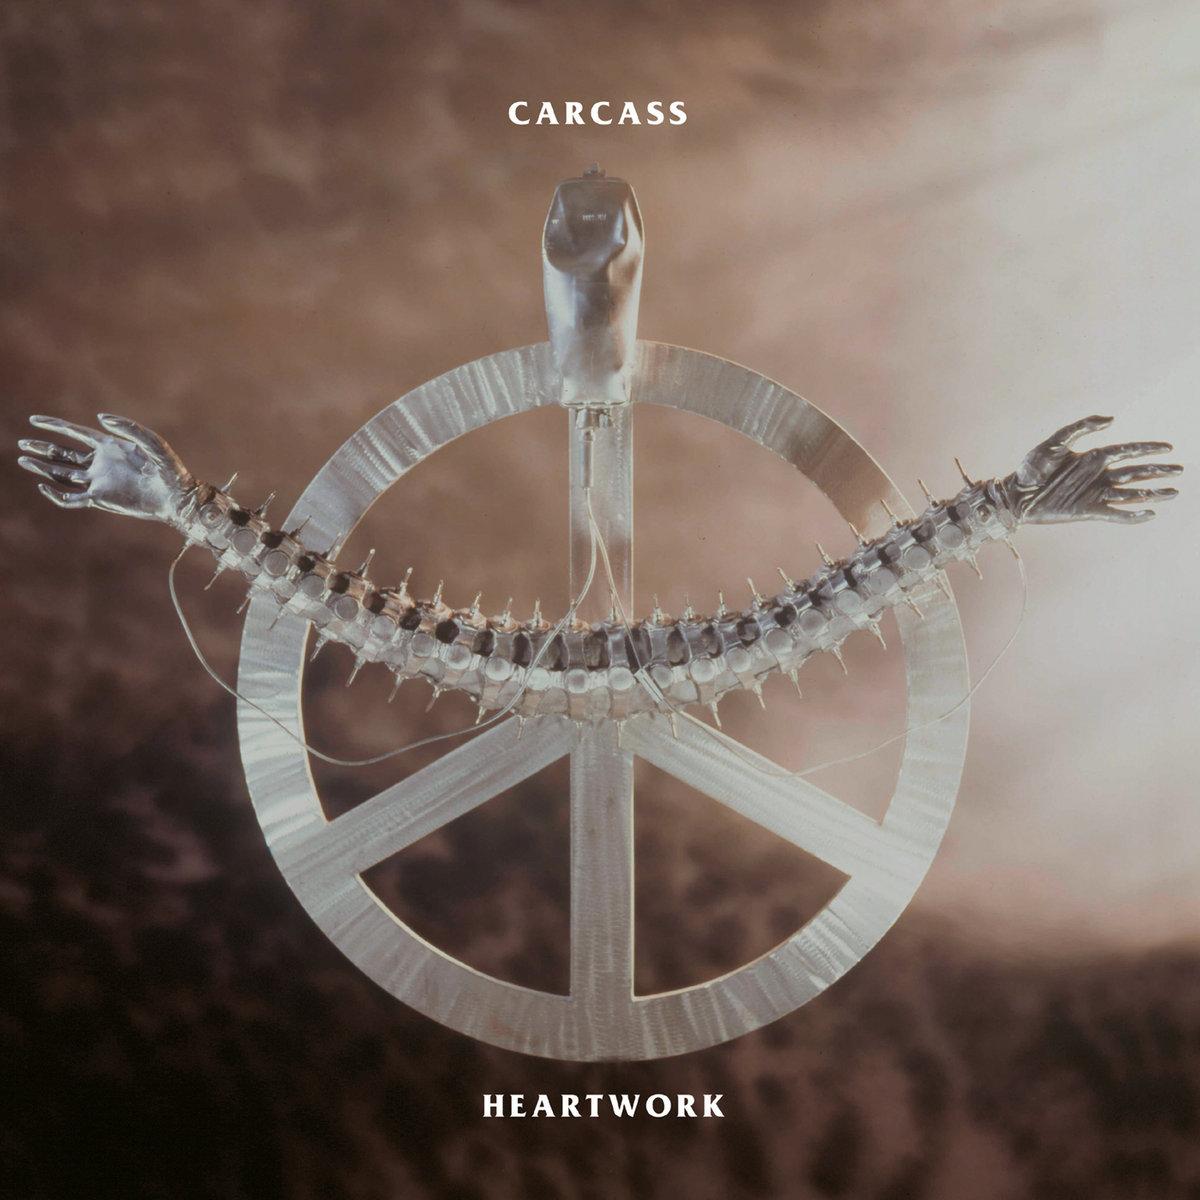 Carcass - Heartwork [Full Dynamic Range Edition 2013]